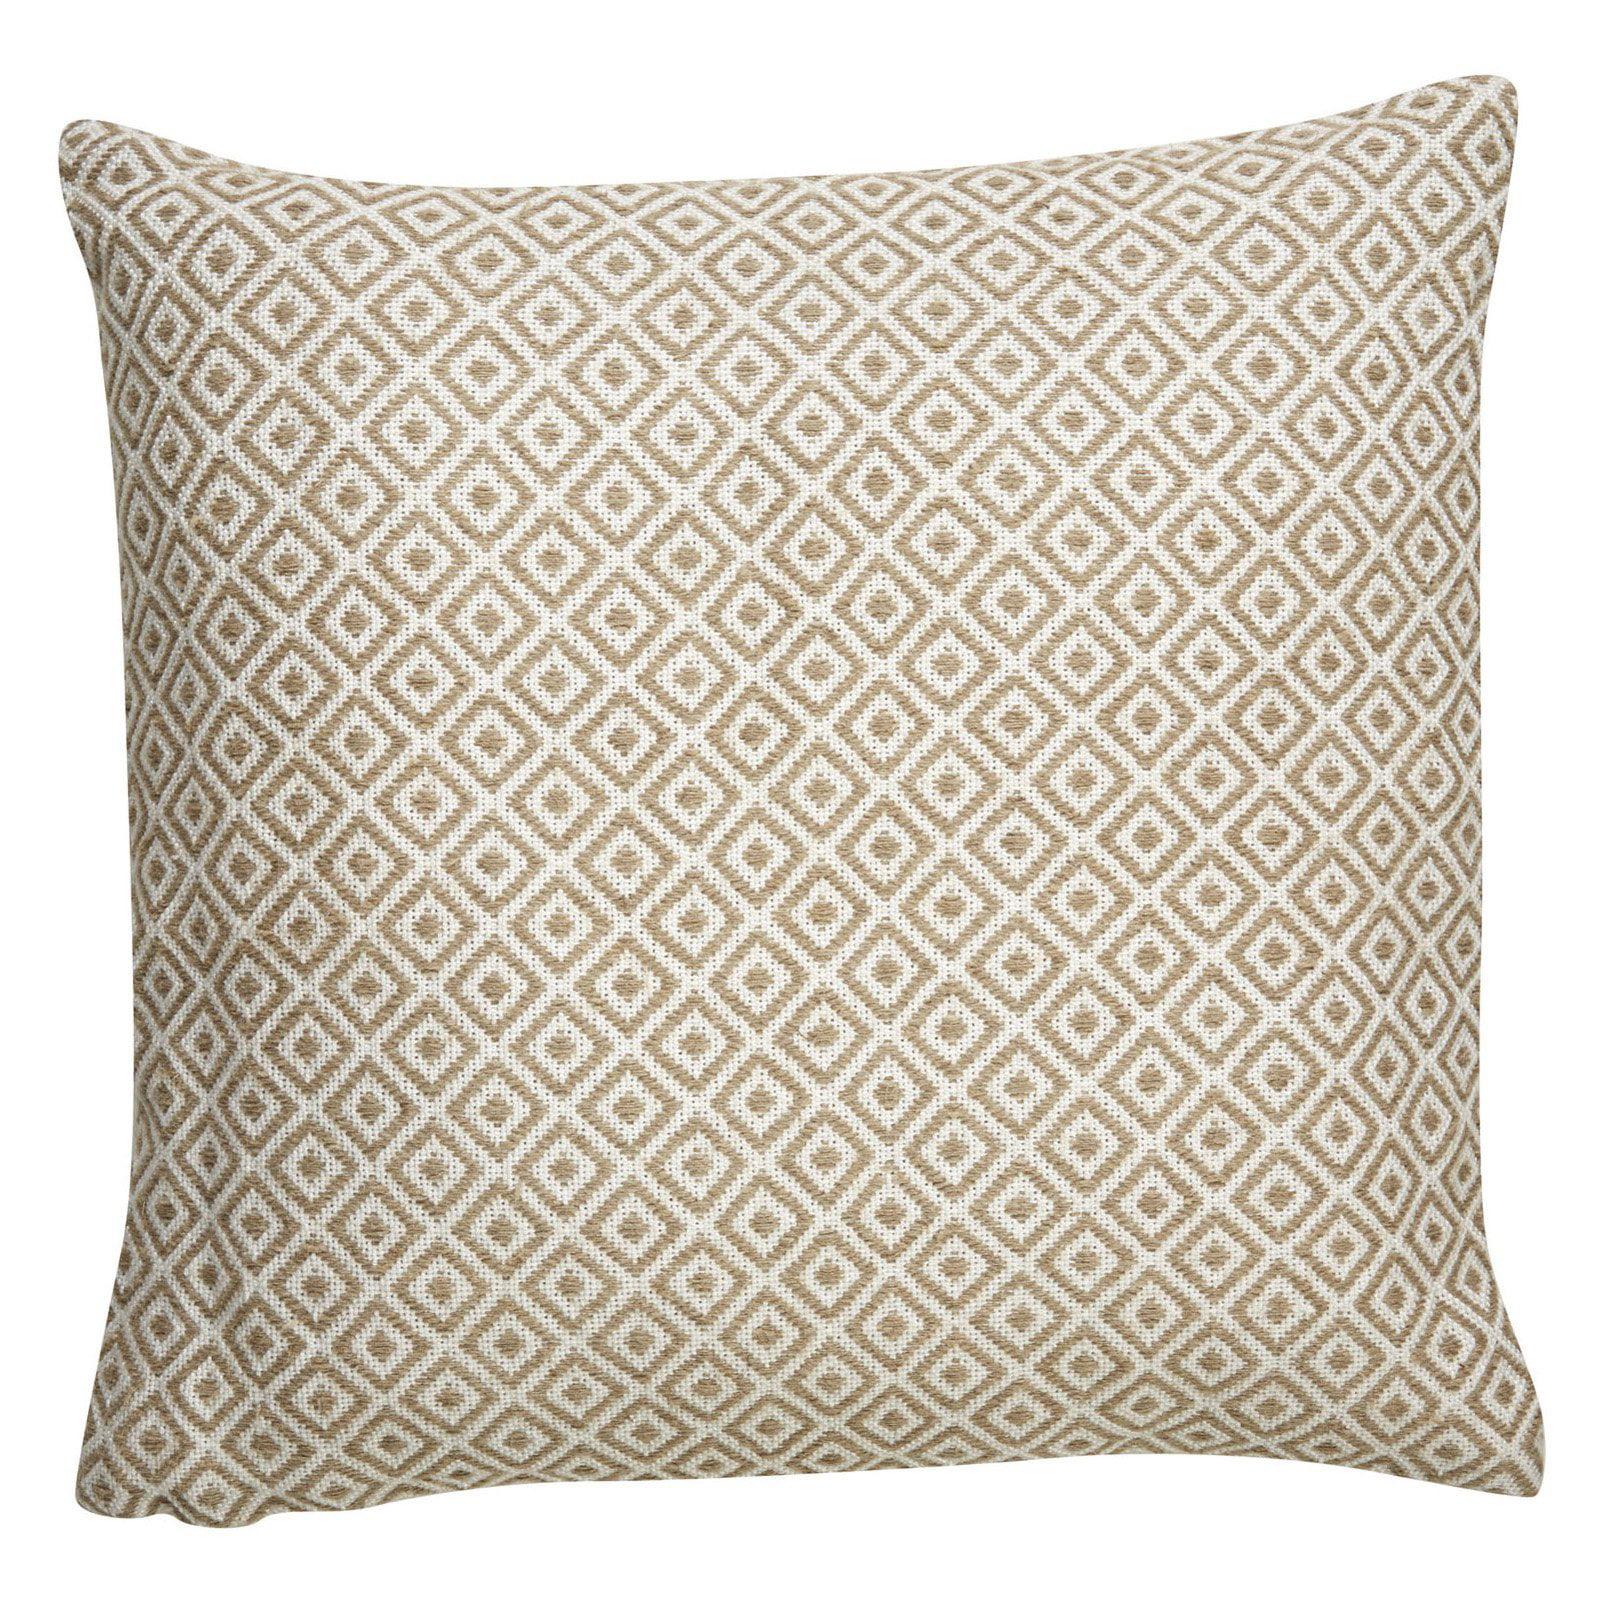 Jaipur Tribal Viscose and Bamboo Decorative Pillow